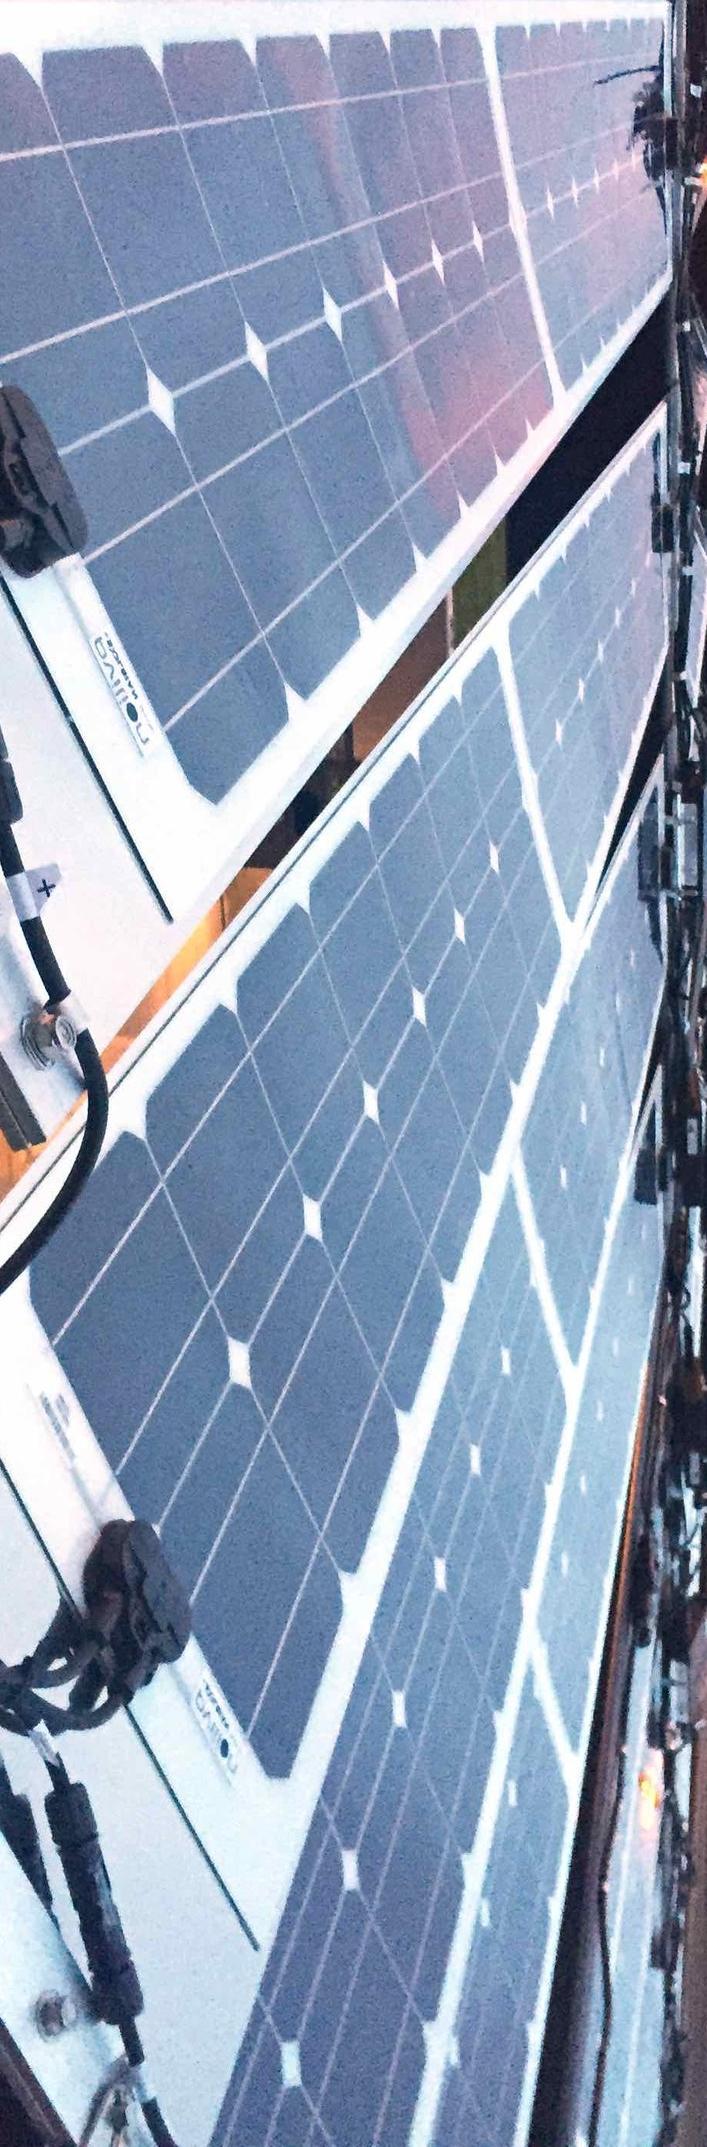 Solar Trellis low res 2.jpg